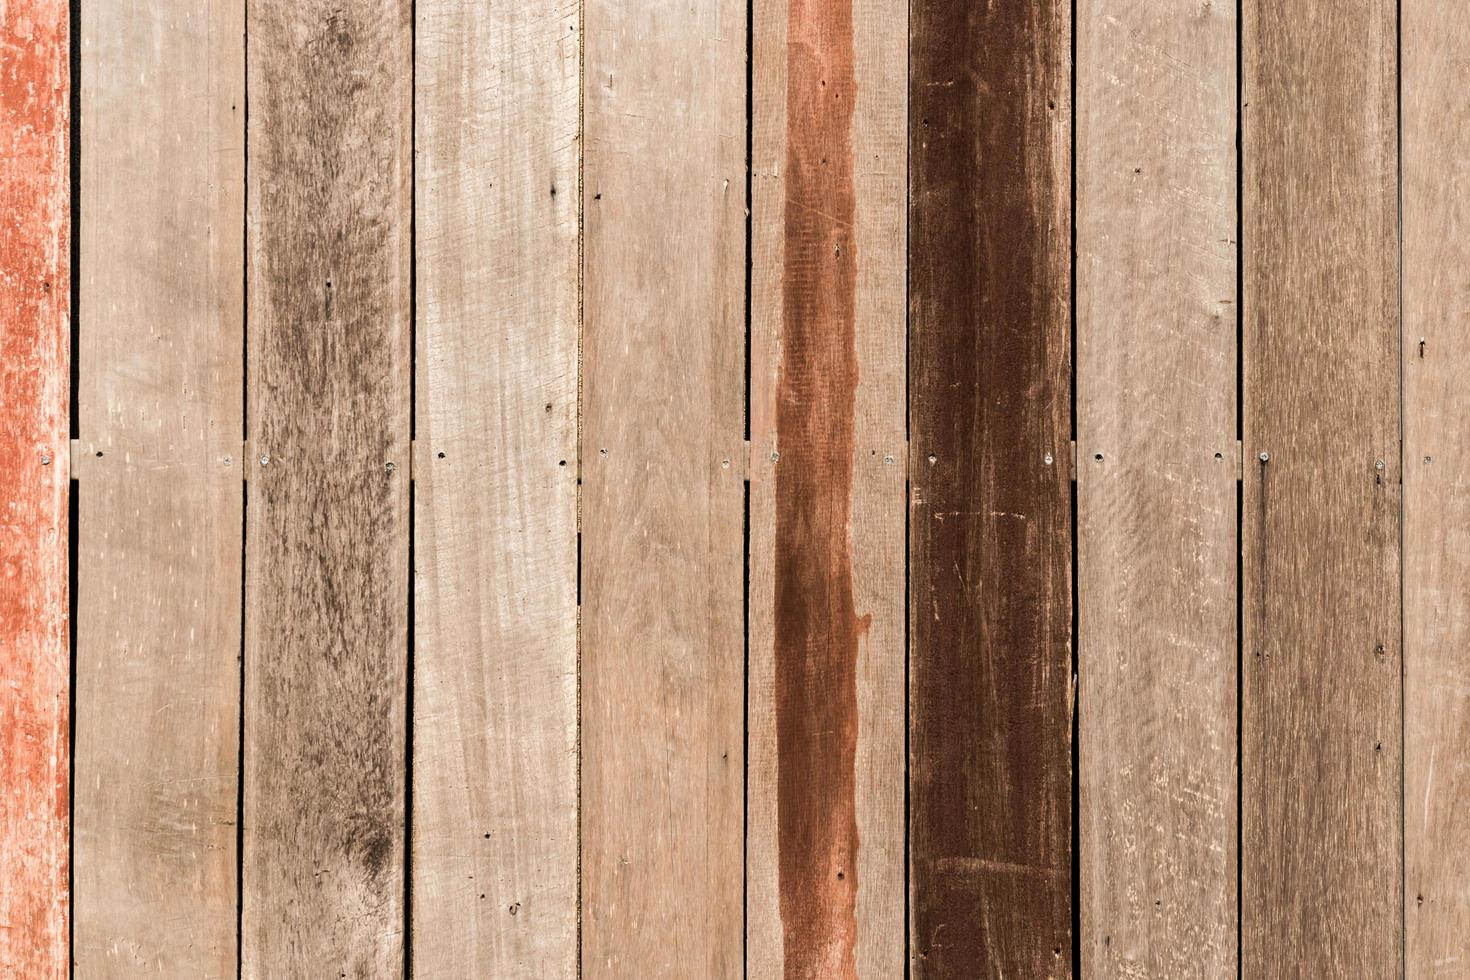 textura de madera. fondo antiguo panel foto